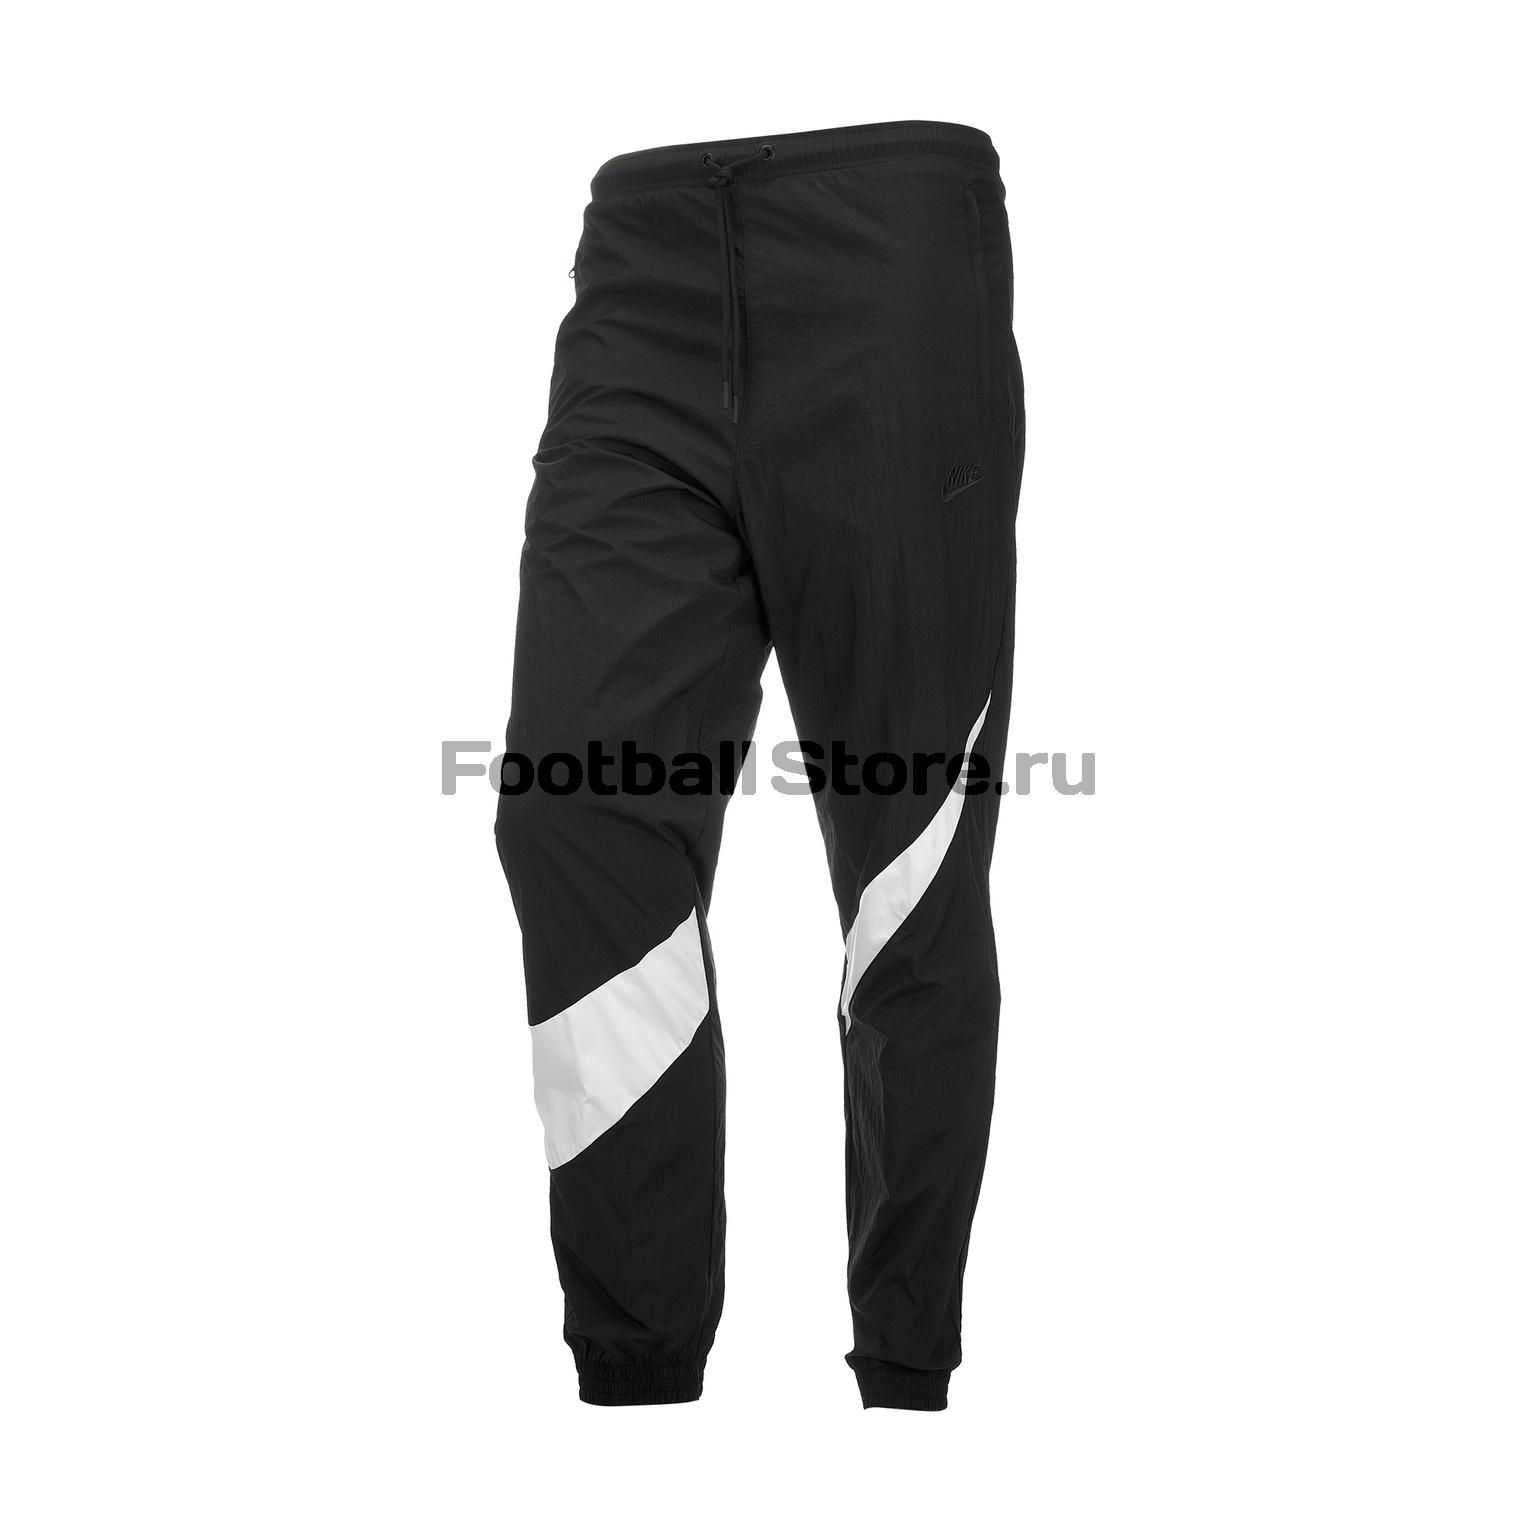 Брюки Nike Pant AR9894-010 цена в Москве и Питере